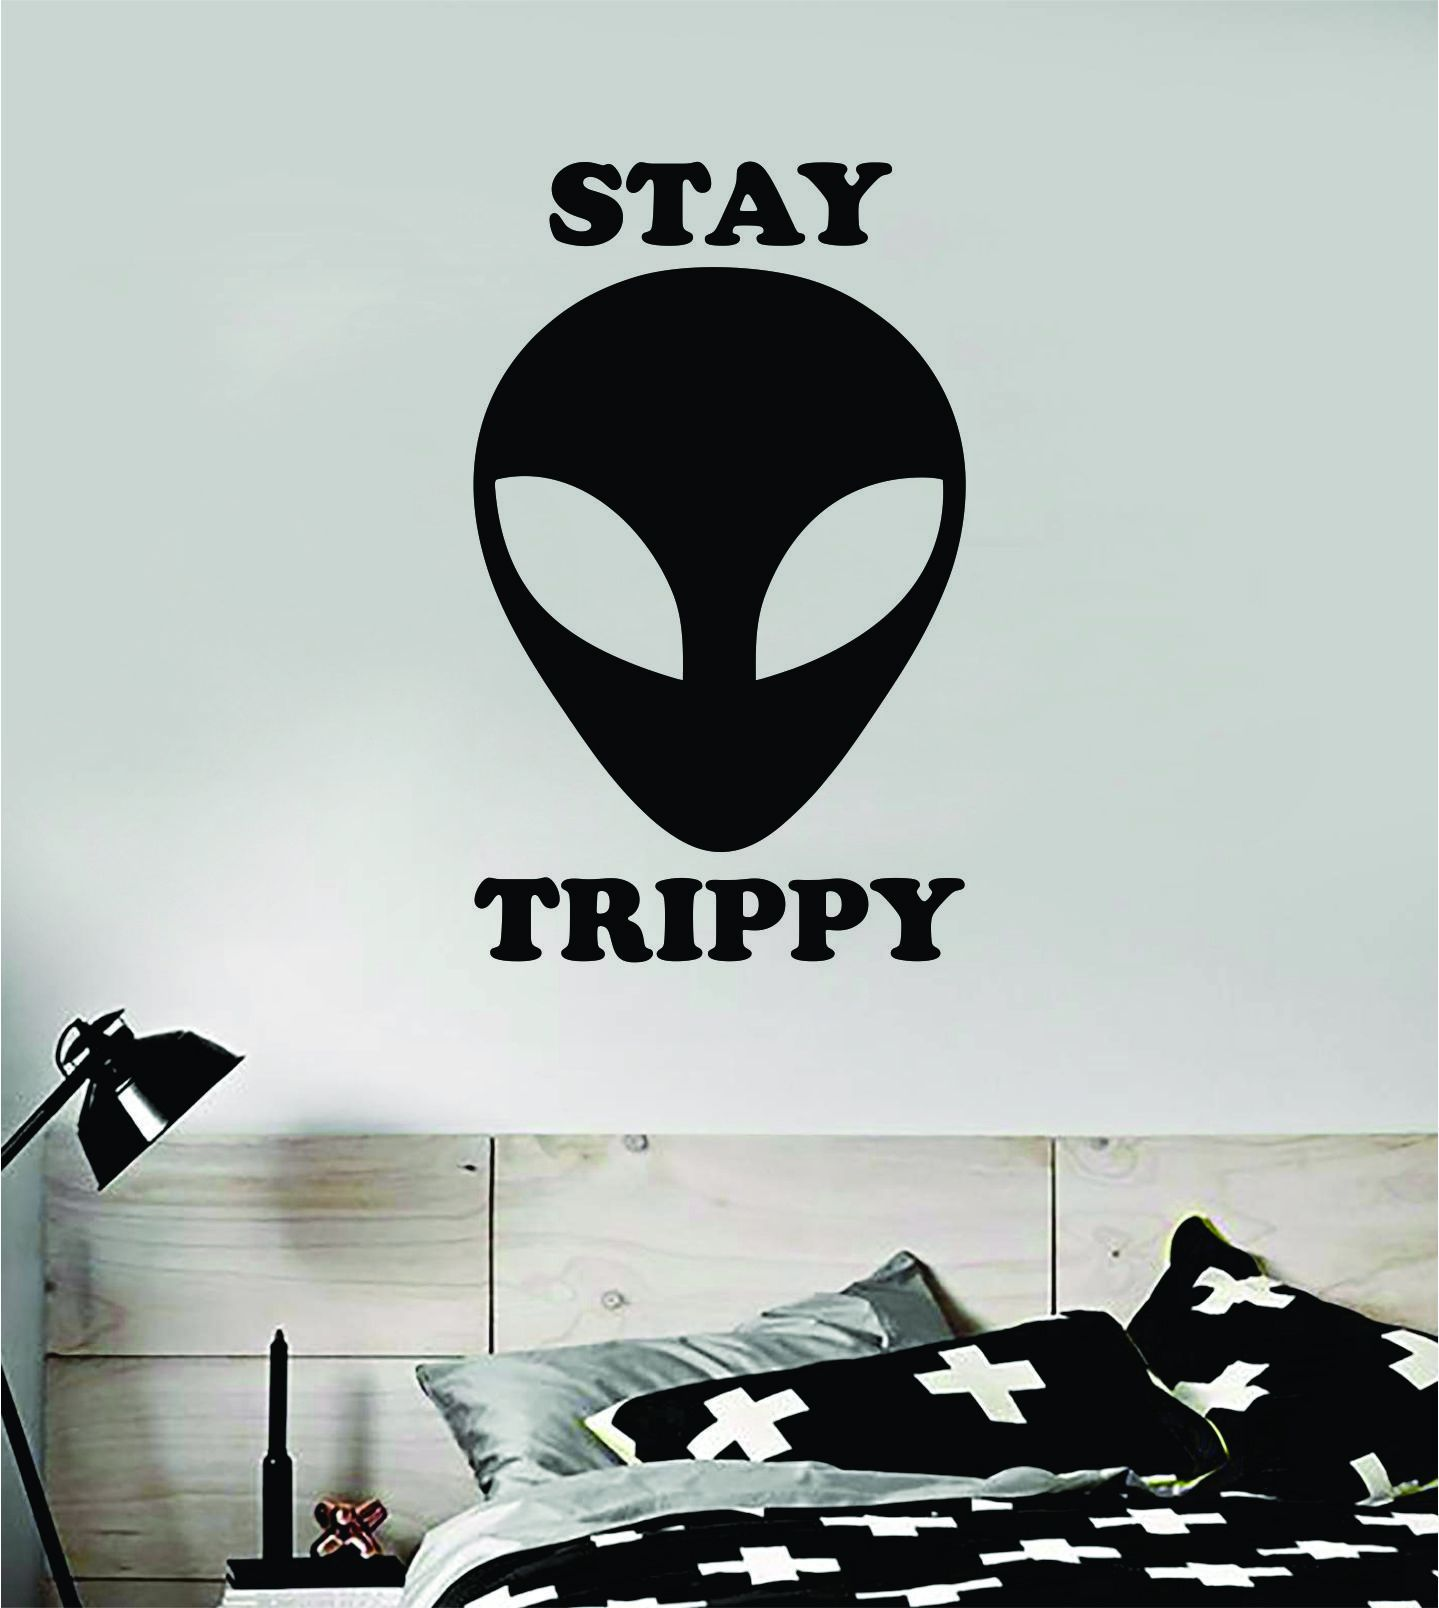 Alien Stay Trippy Wall Decal Home Decor Sticker Vinyl Art Home Bedroom Room Quote Space Martian Area 51 Mars UFO Teen - grey